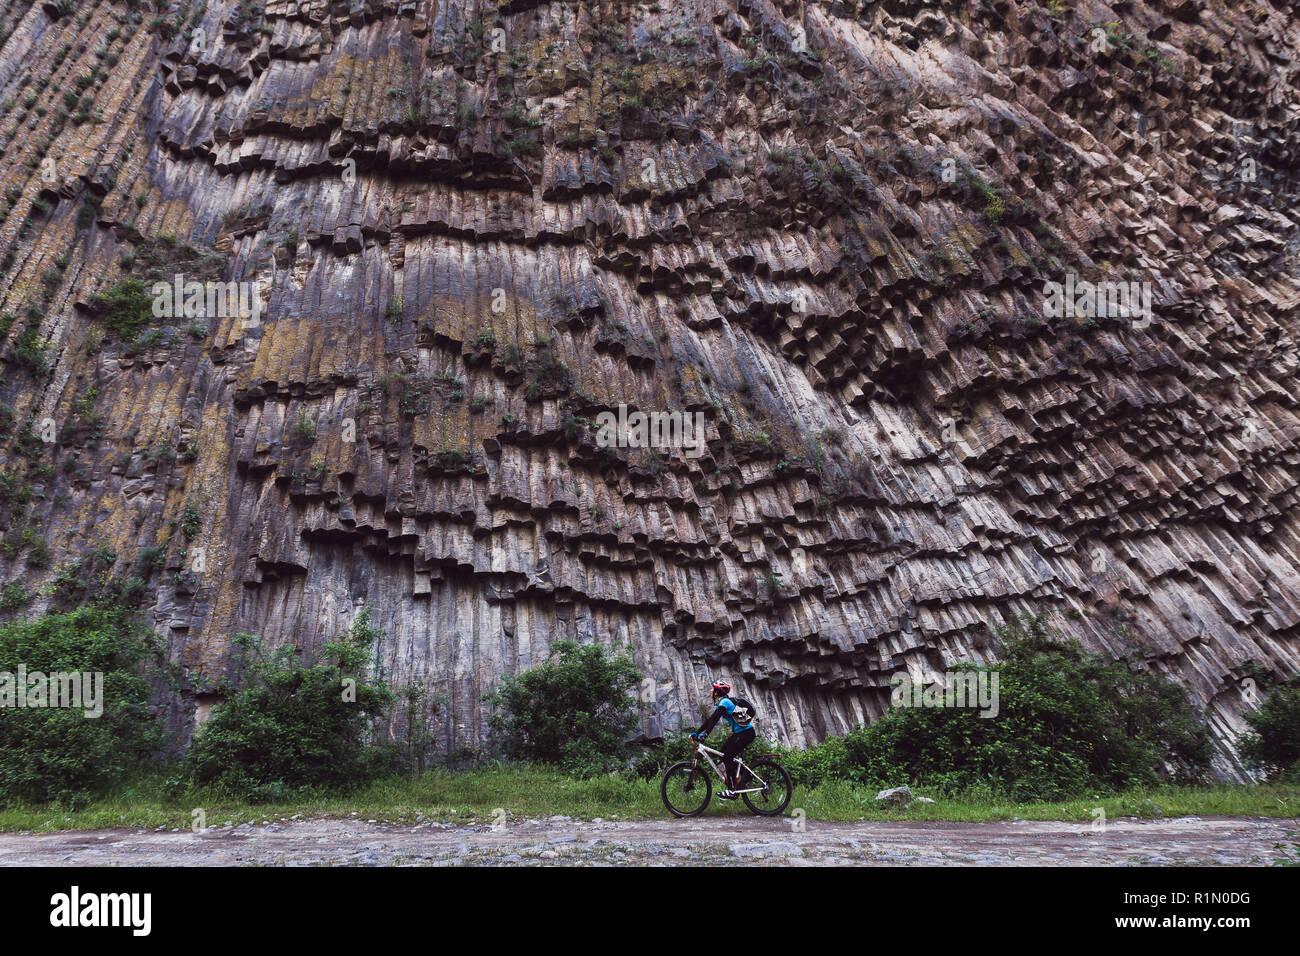 Tavel in bici in canyon pietre Sinfonia in Armenia Immagini Stock